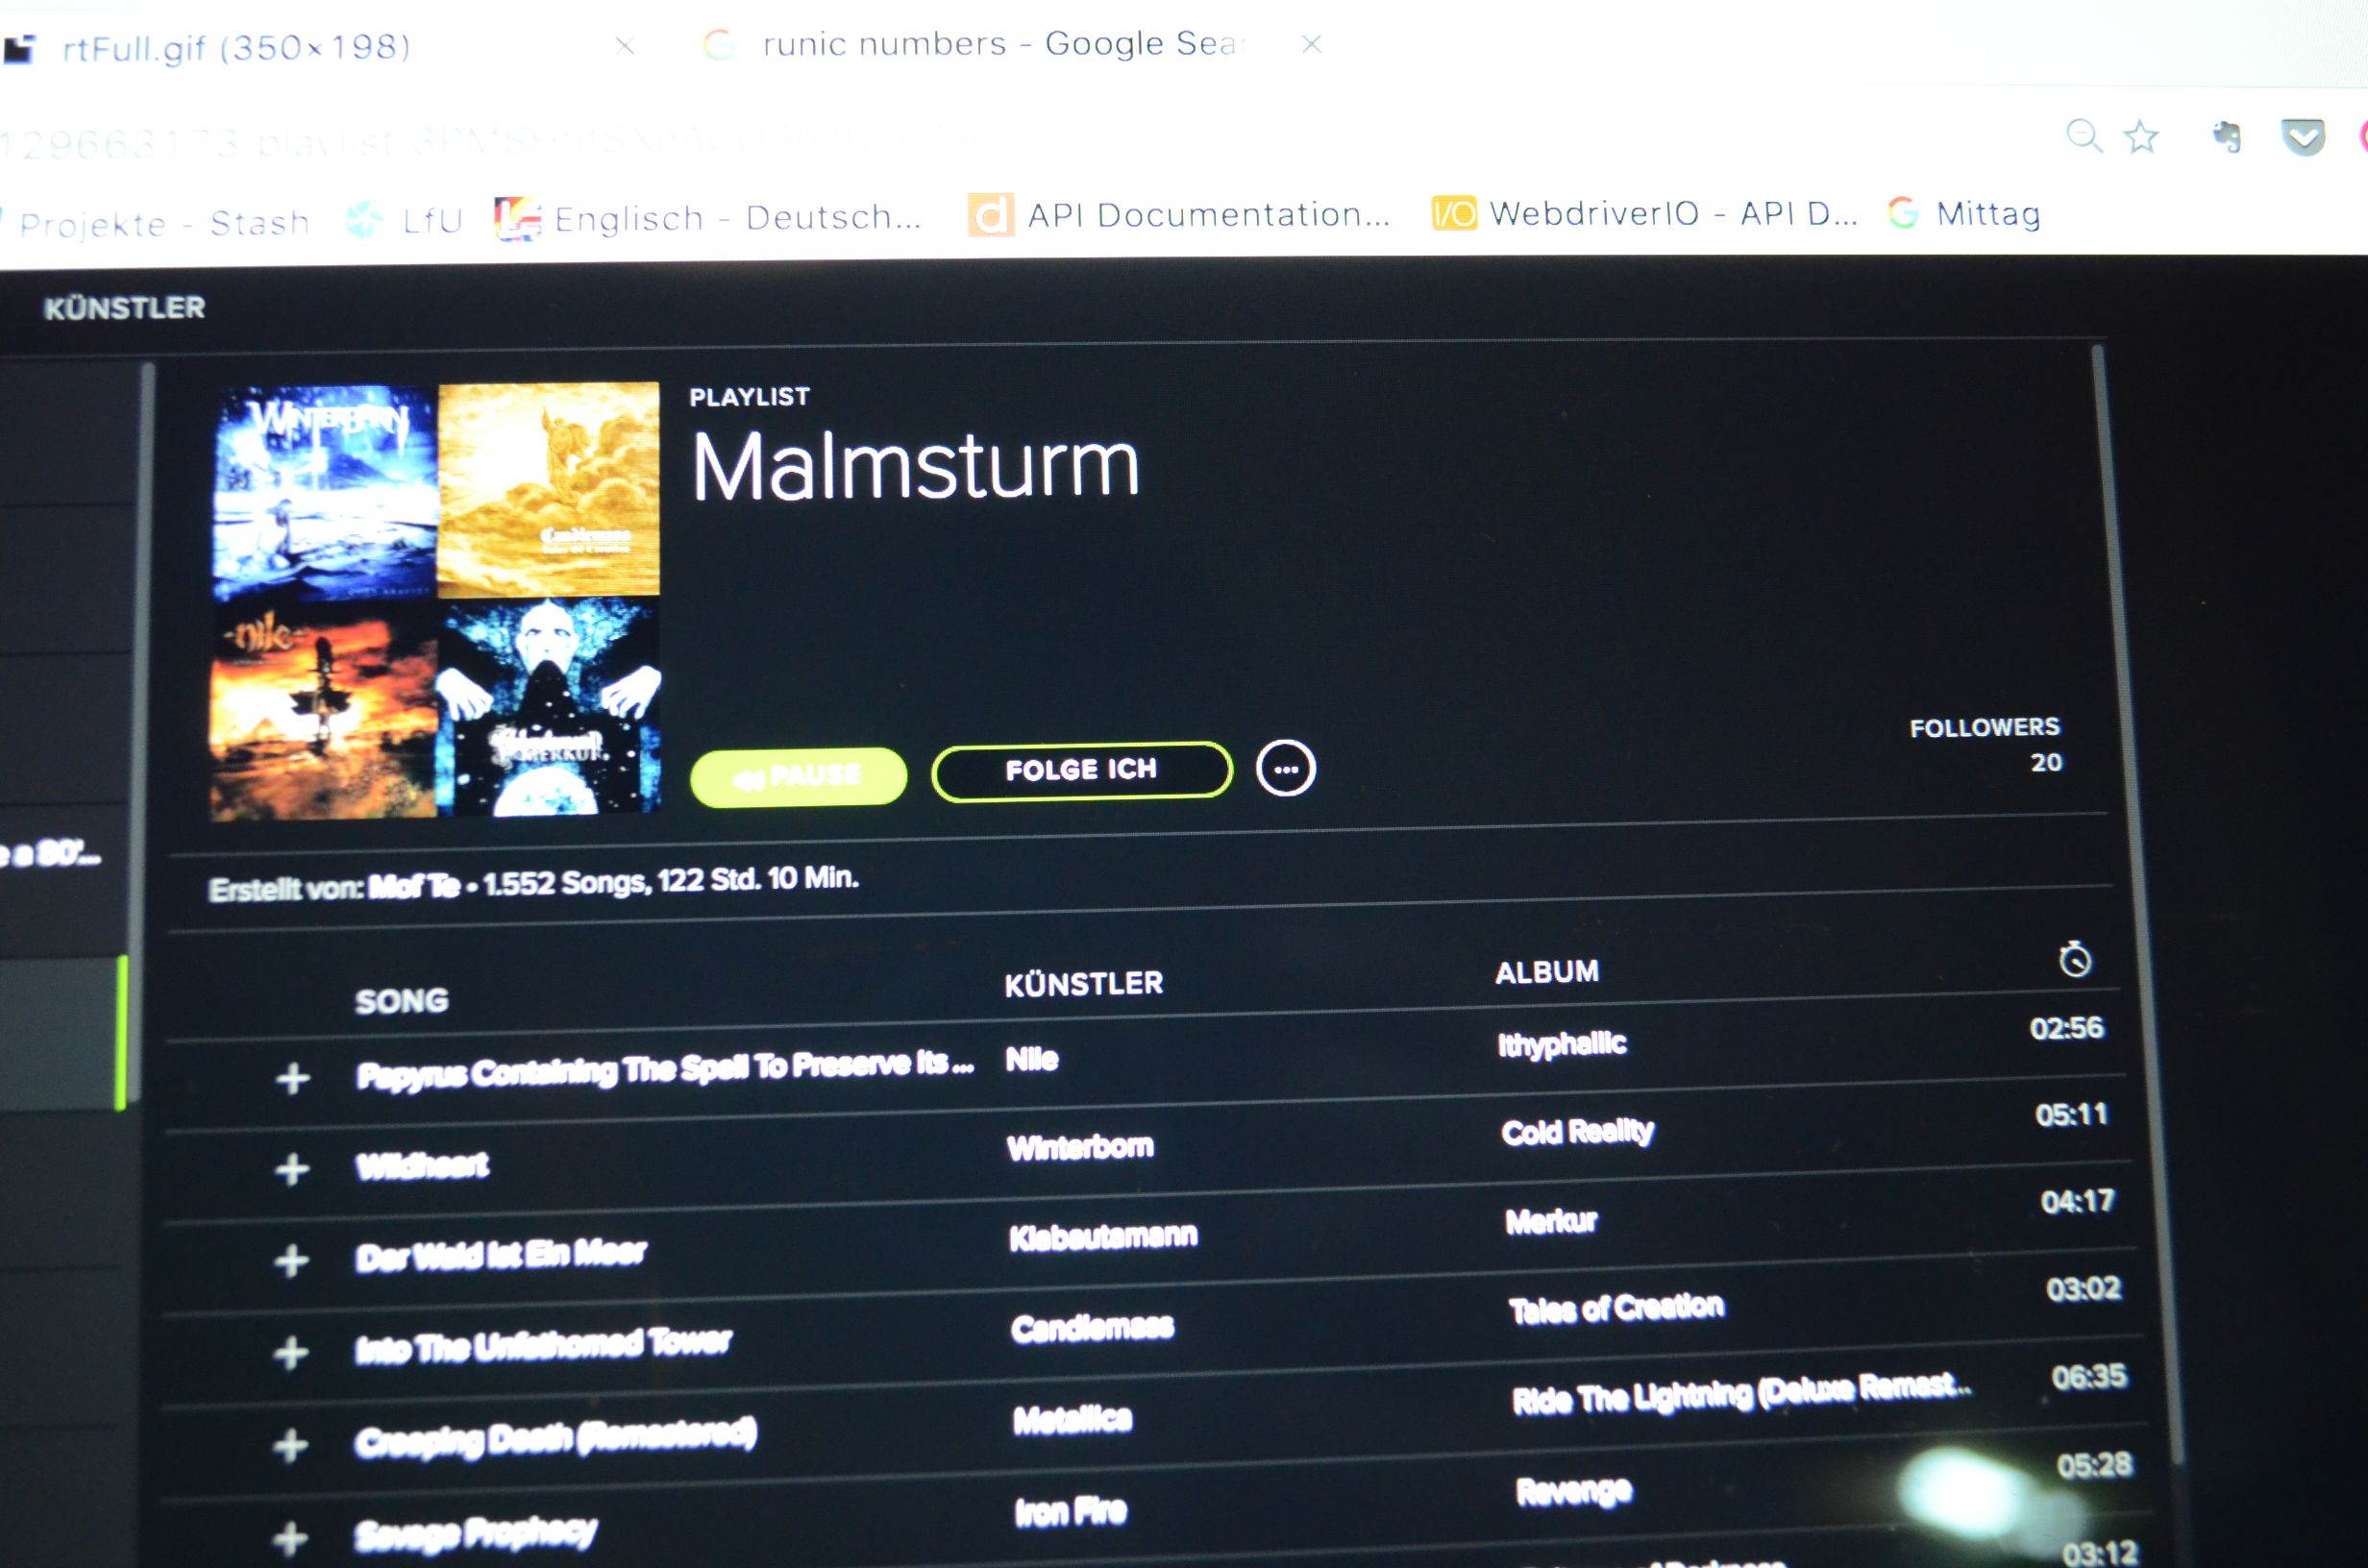 Malmsturm-Playlist